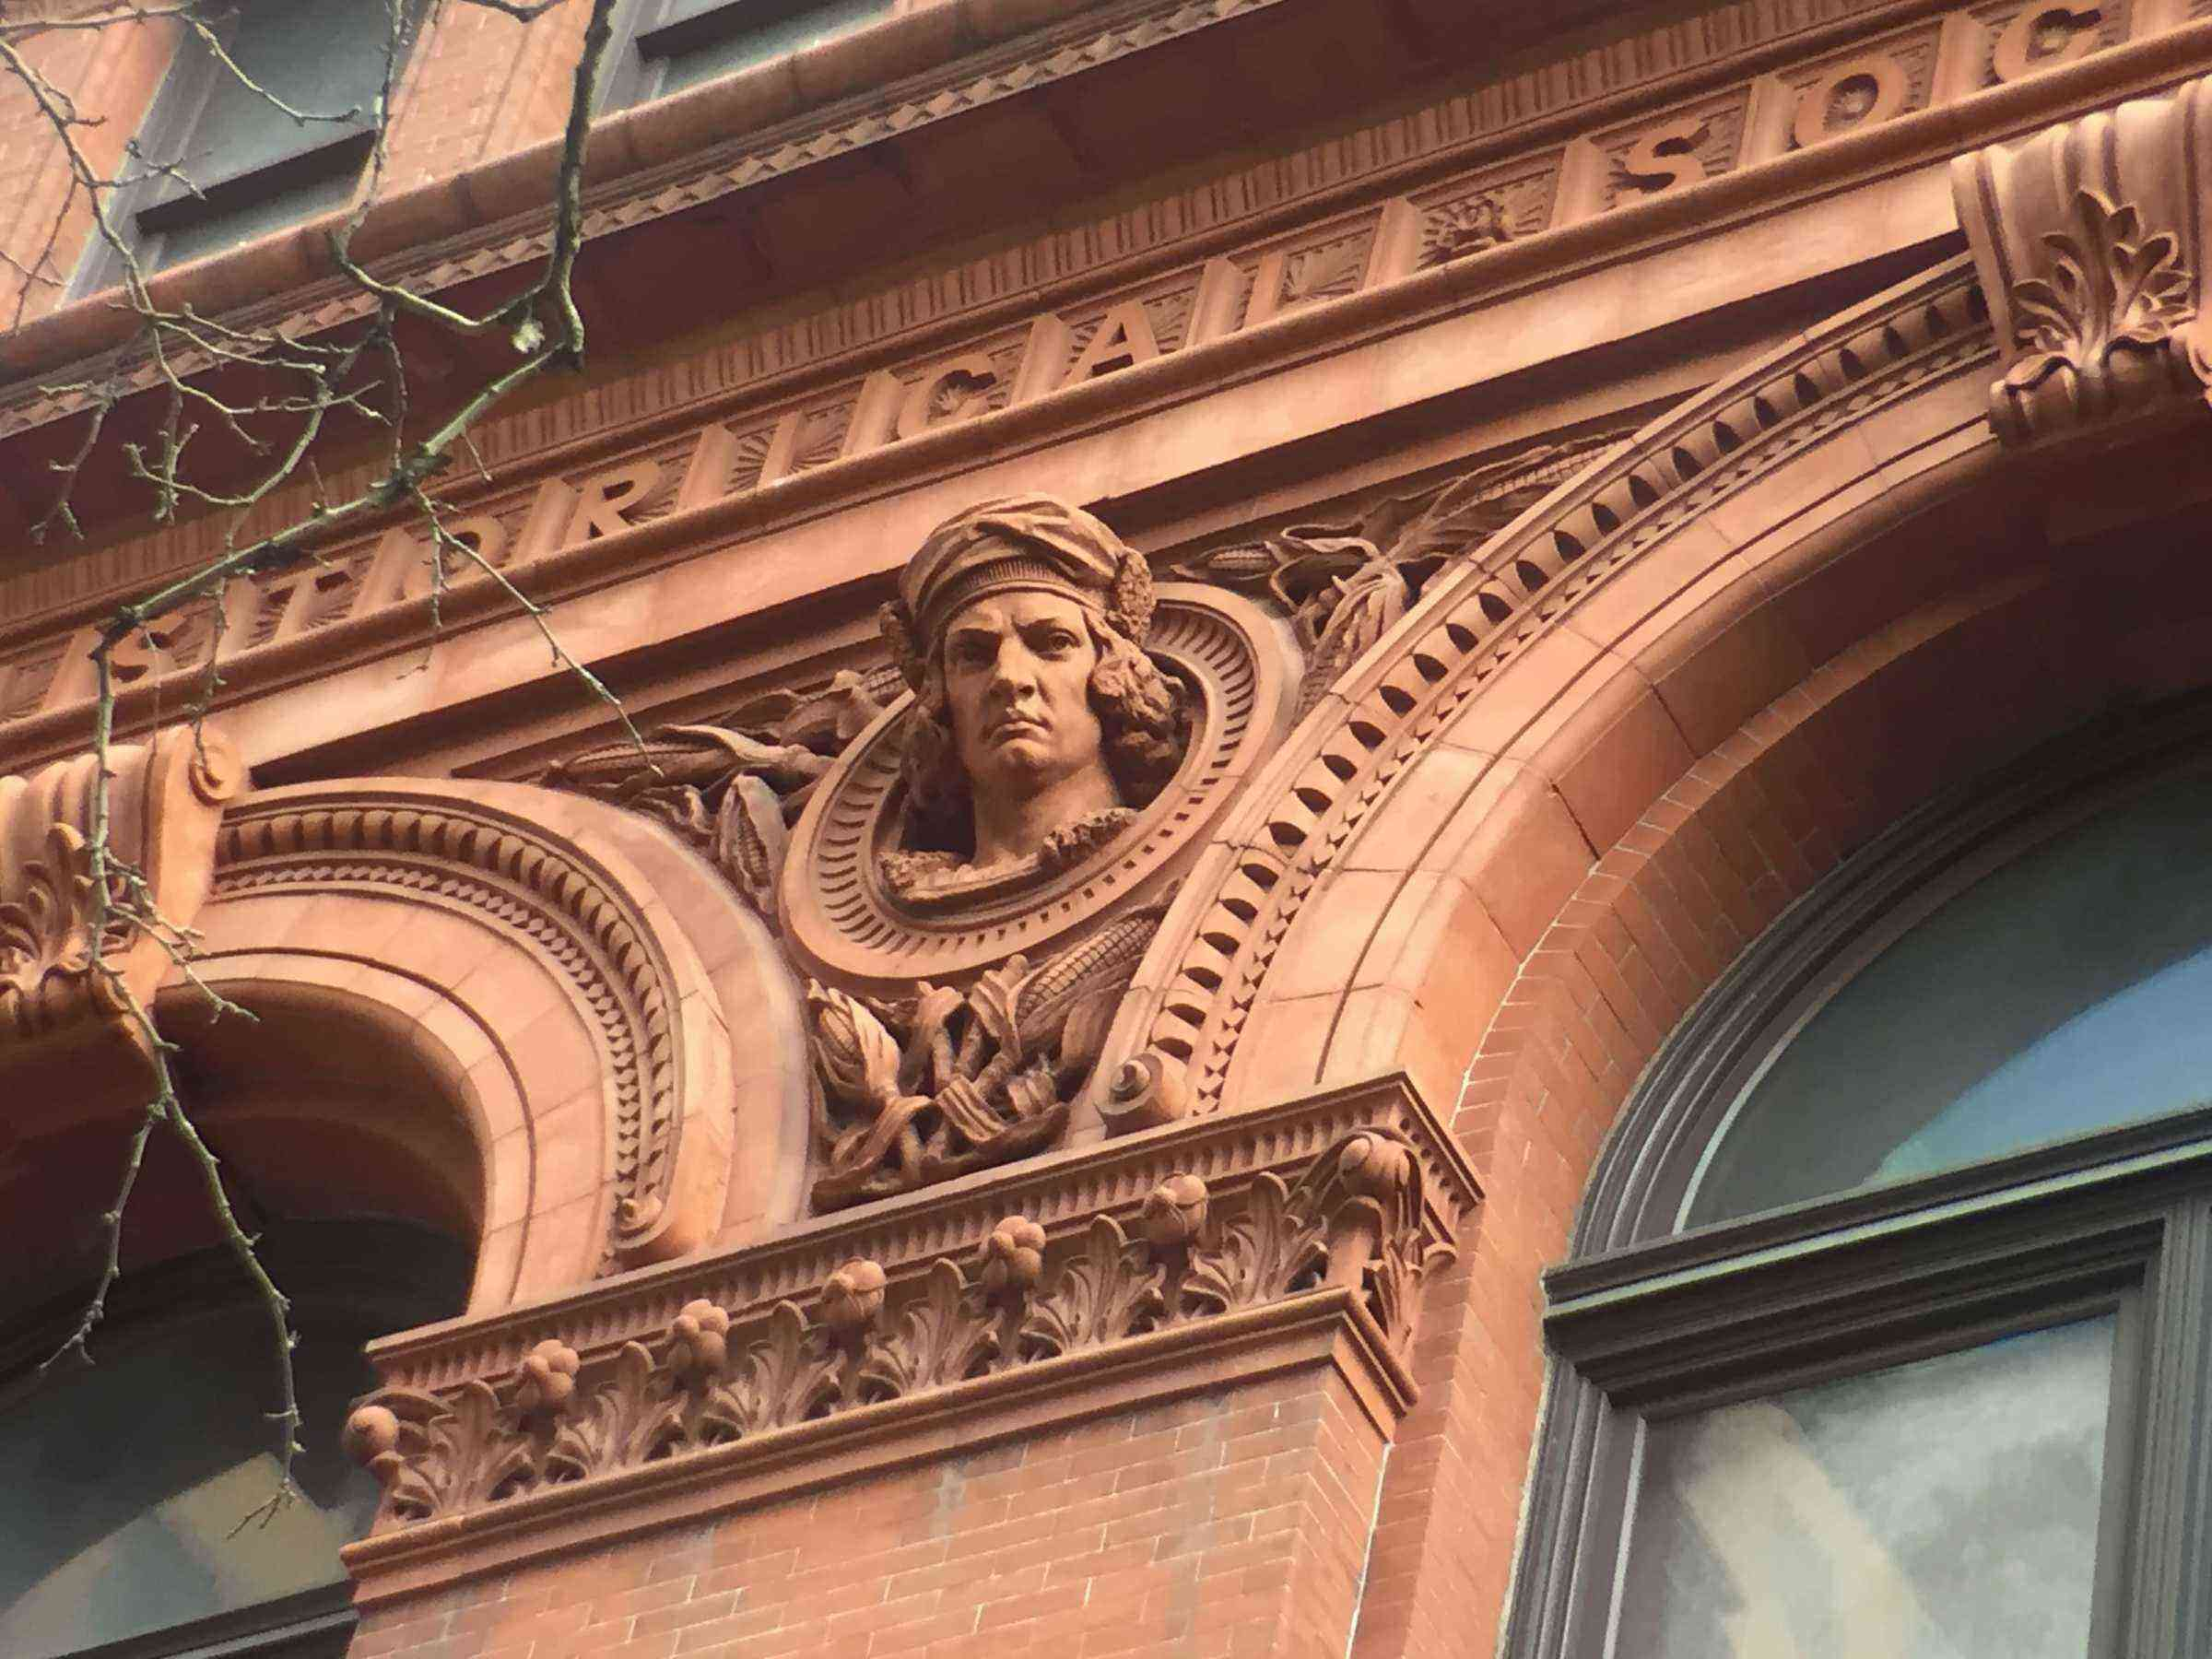 3) Brooklyn Historical Society, Columbus